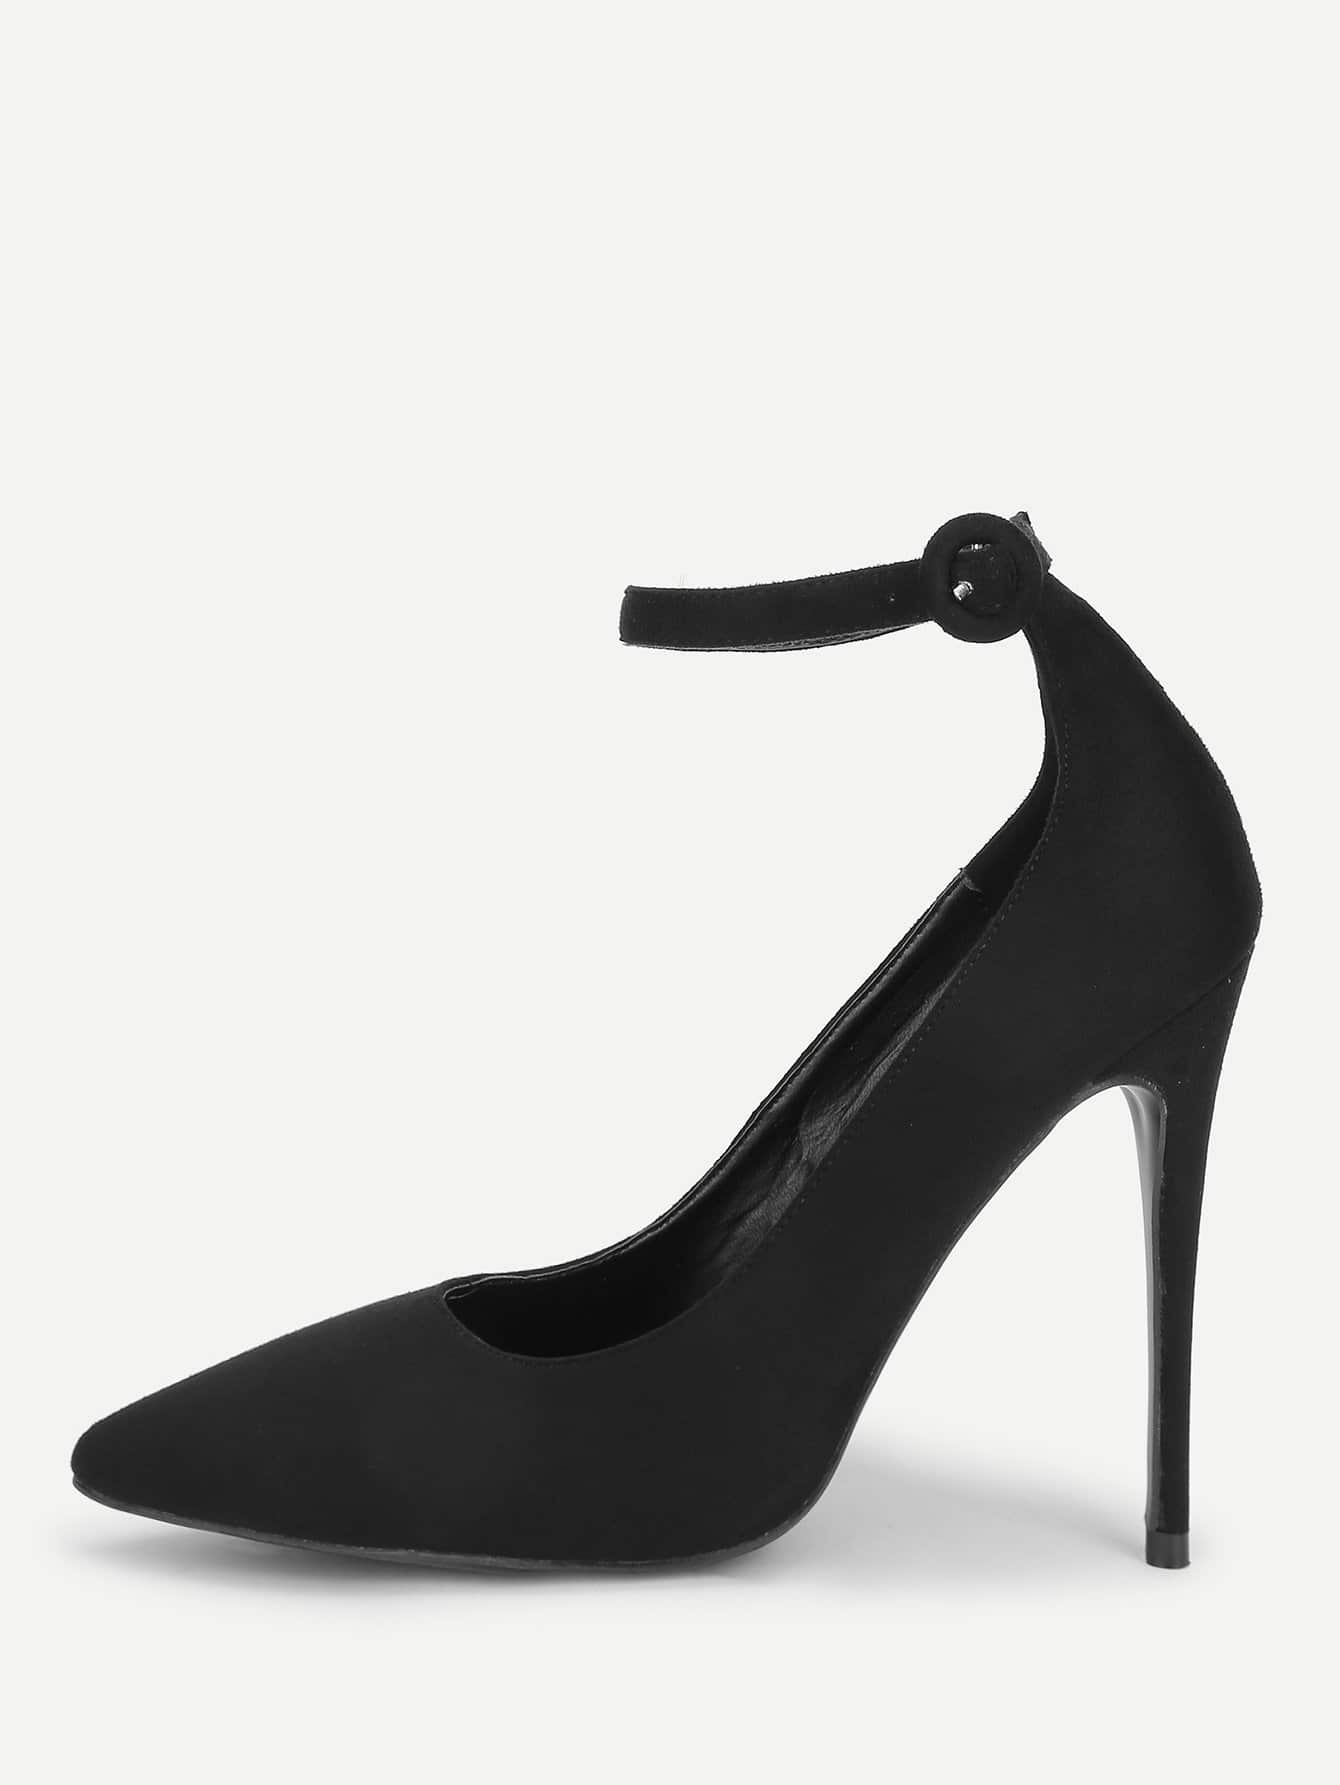 Pointed Toe Ankle Strap Stiletto Heels stiletto metallic ankle strap heels